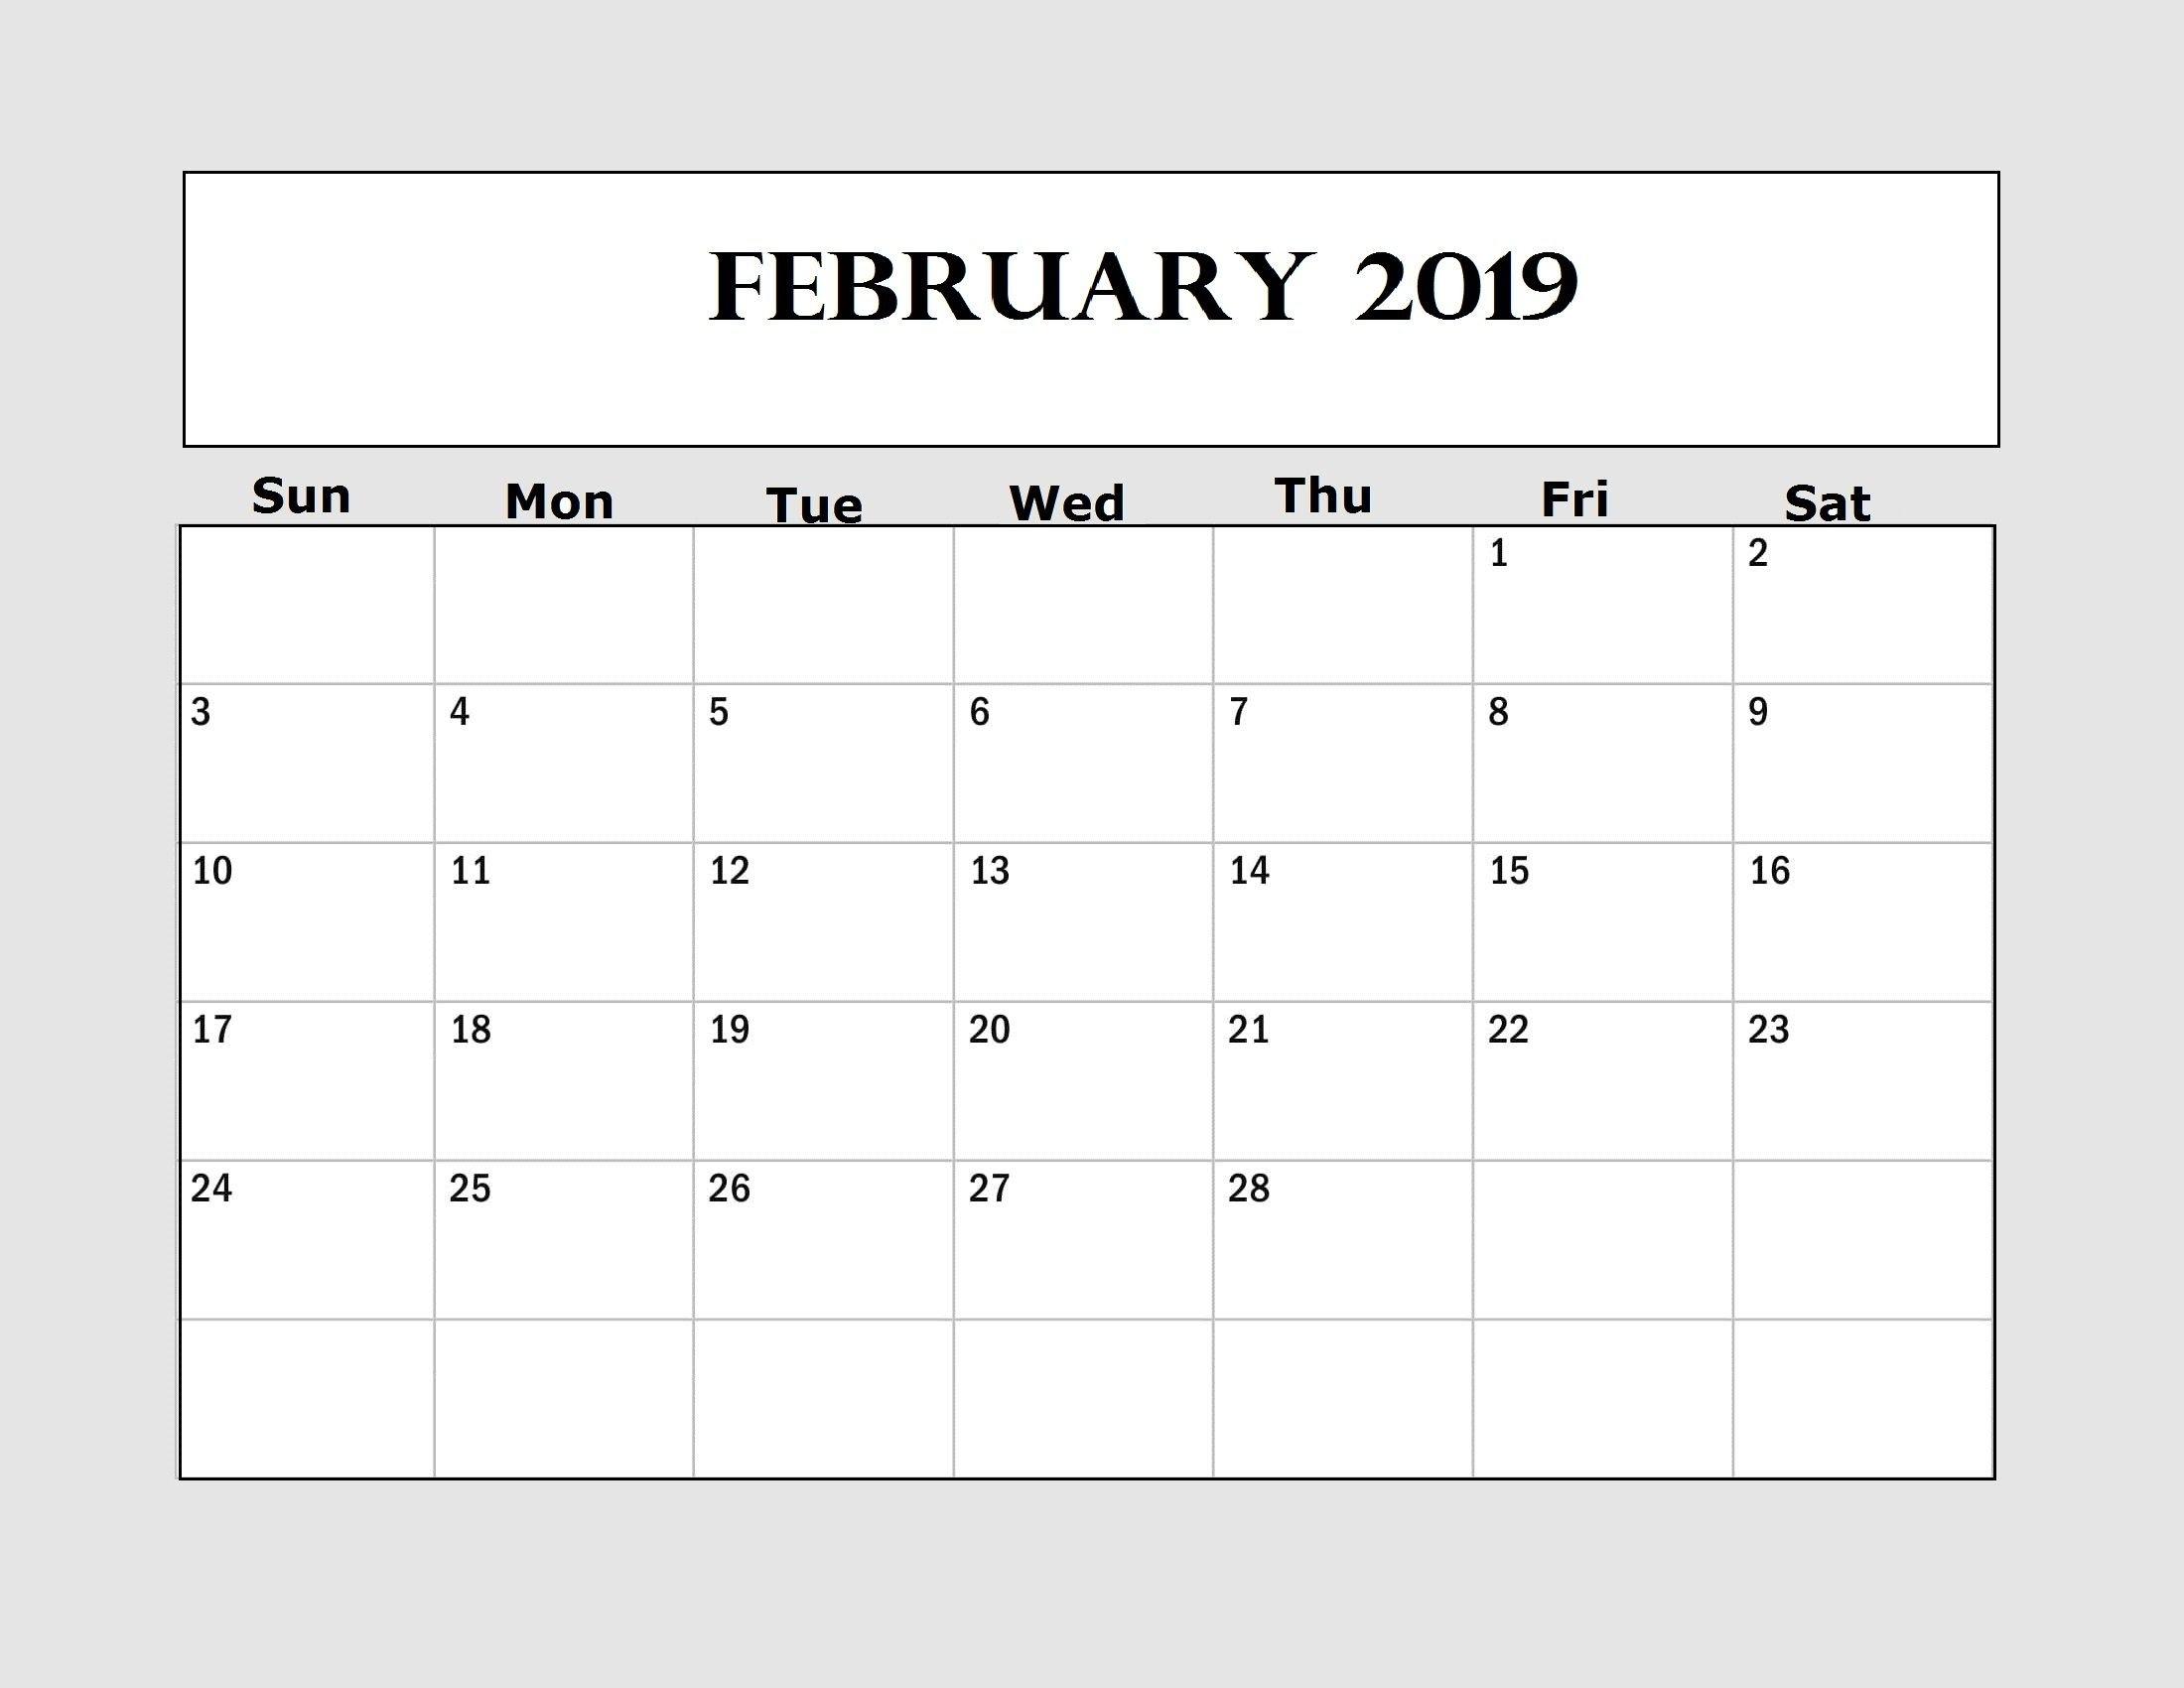 February 2019 Printable Calendar Creator | February 2019 Calendar Calendar 2019 Creator